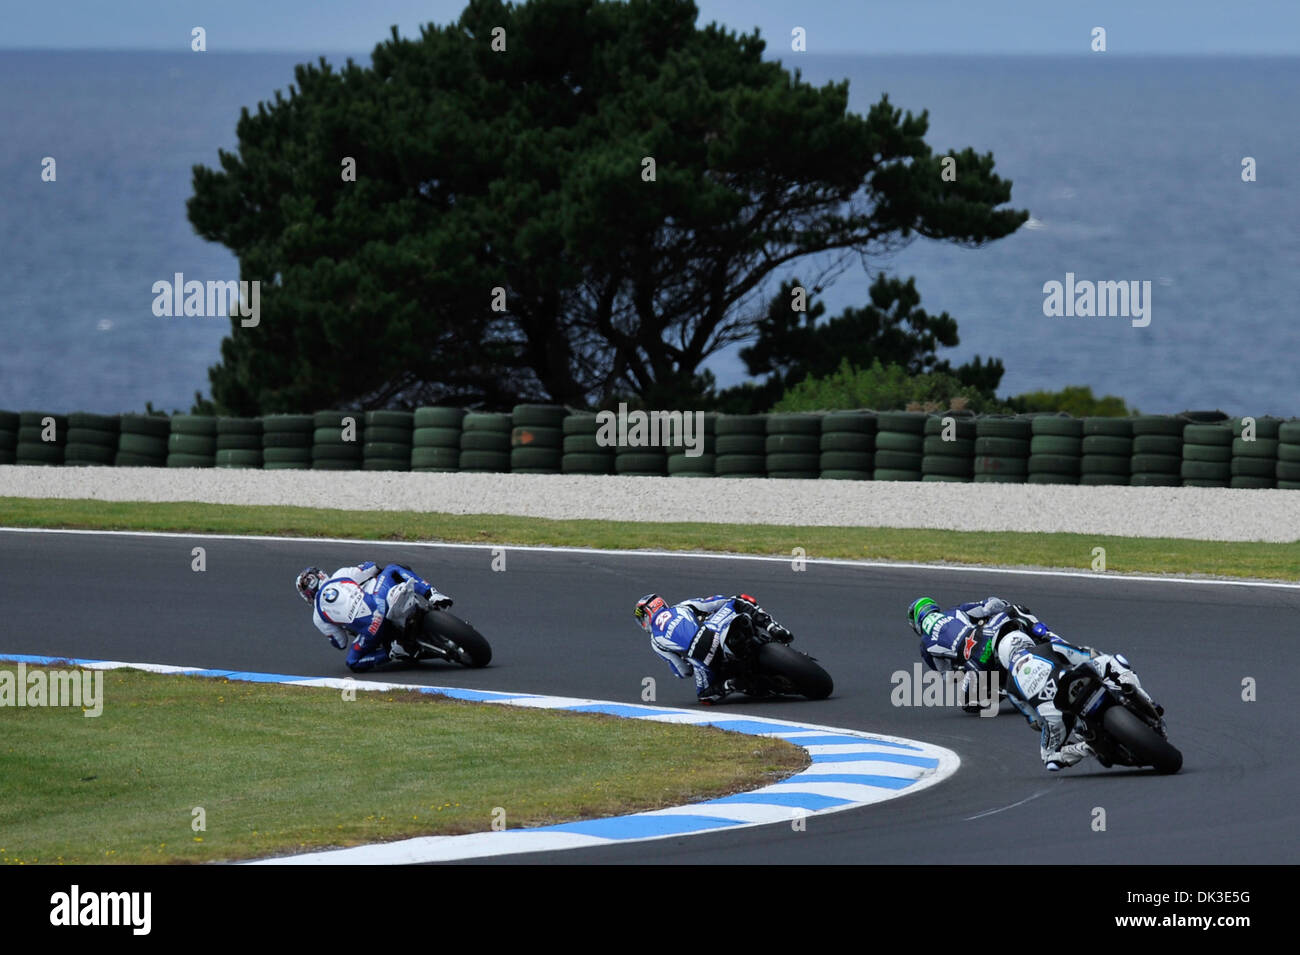 Feb. 27, 2011 - Phillip Island, Victoria, Australia - Riders cornering through Siberia turn during race one of round Stock Photo